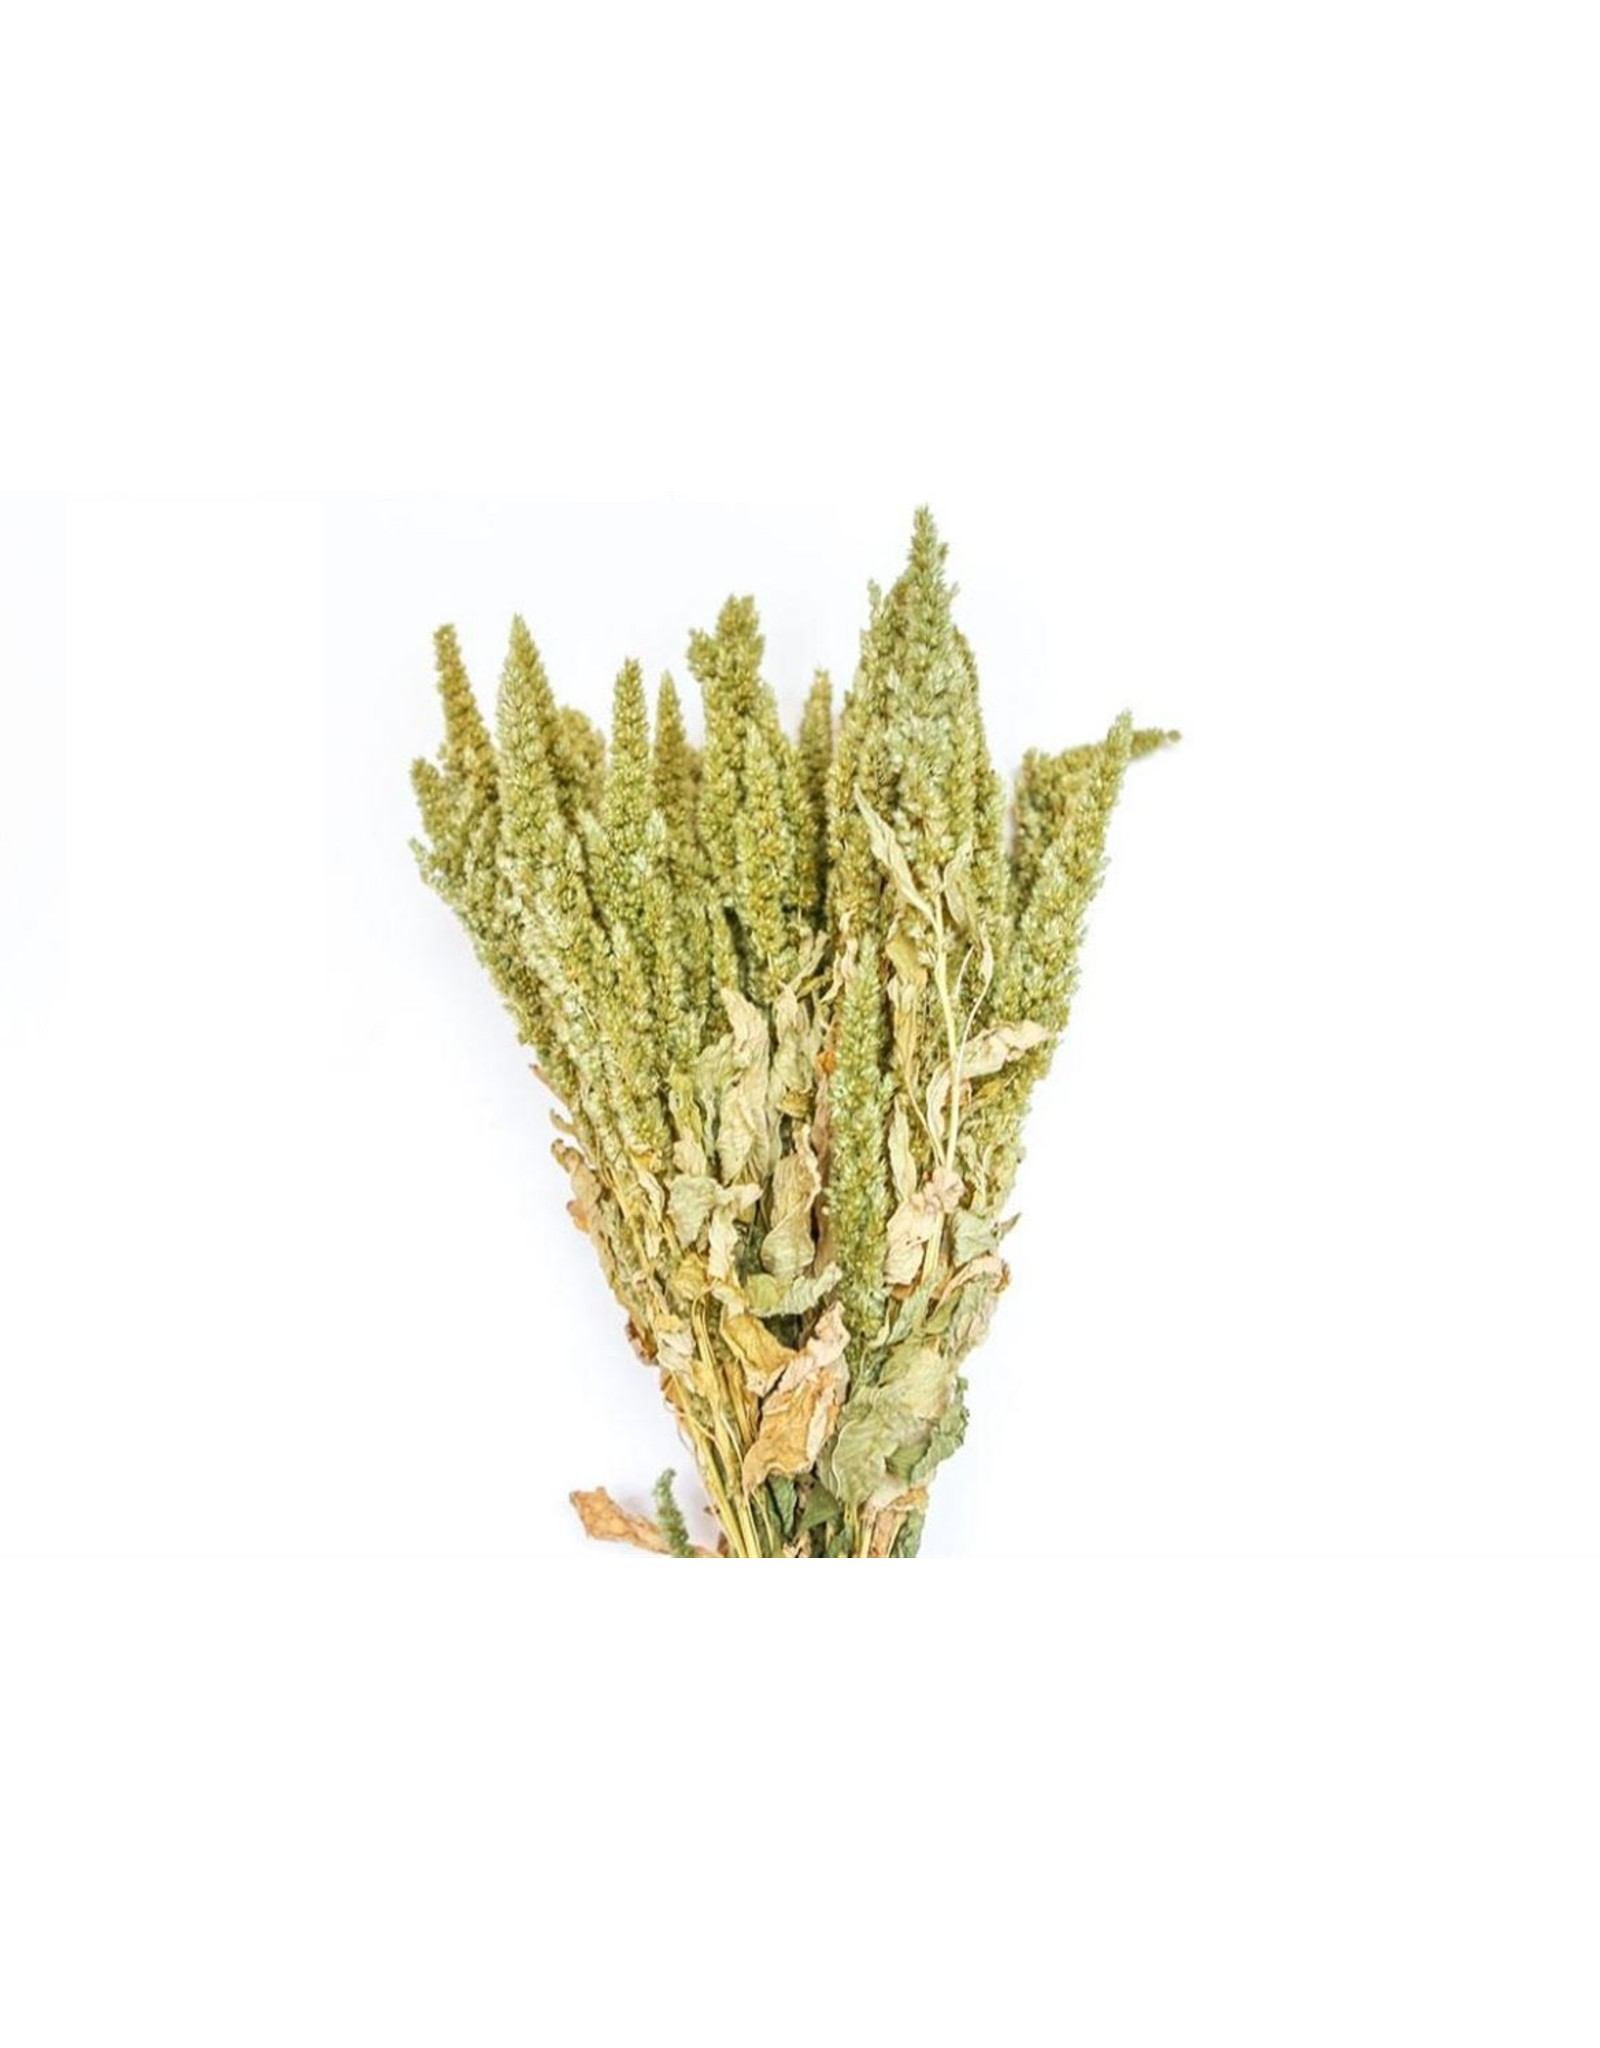 HD bos Amaranthus groen in hoes ↑50.0 (x 15)